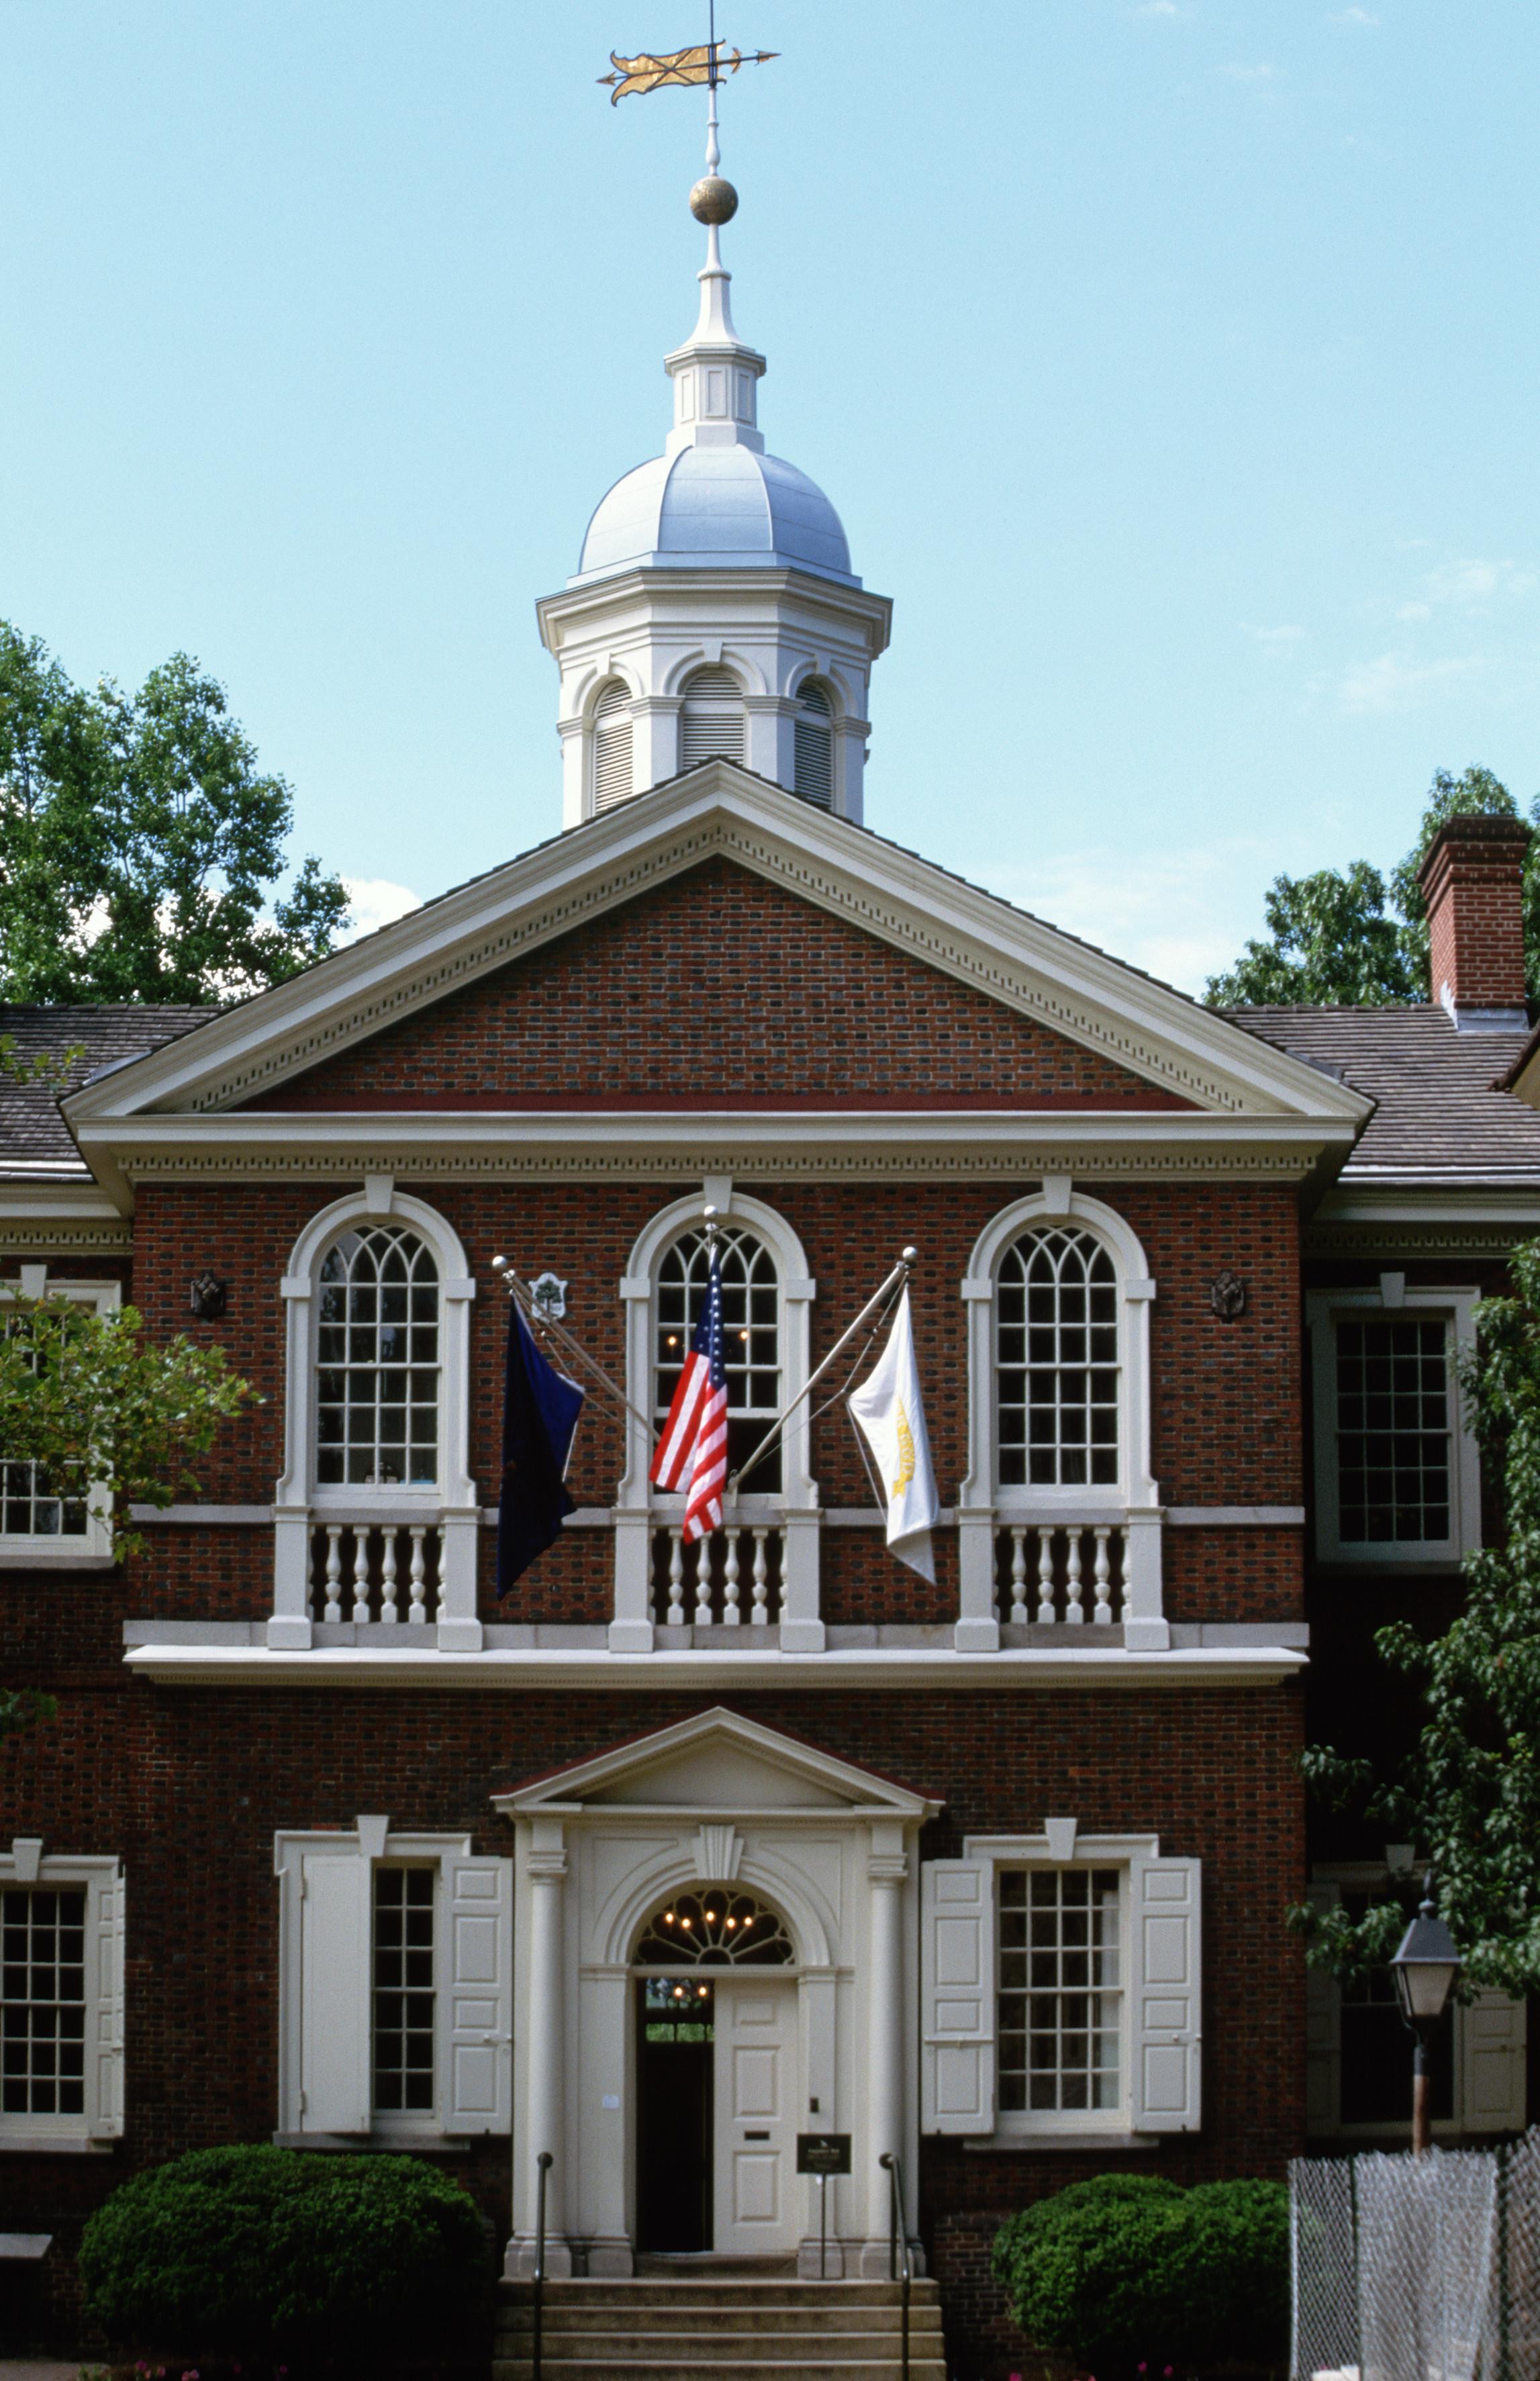 Carpenter Philadelphia  1774, american colonies, carpenter's hall, philadelphia, the british, john adams,